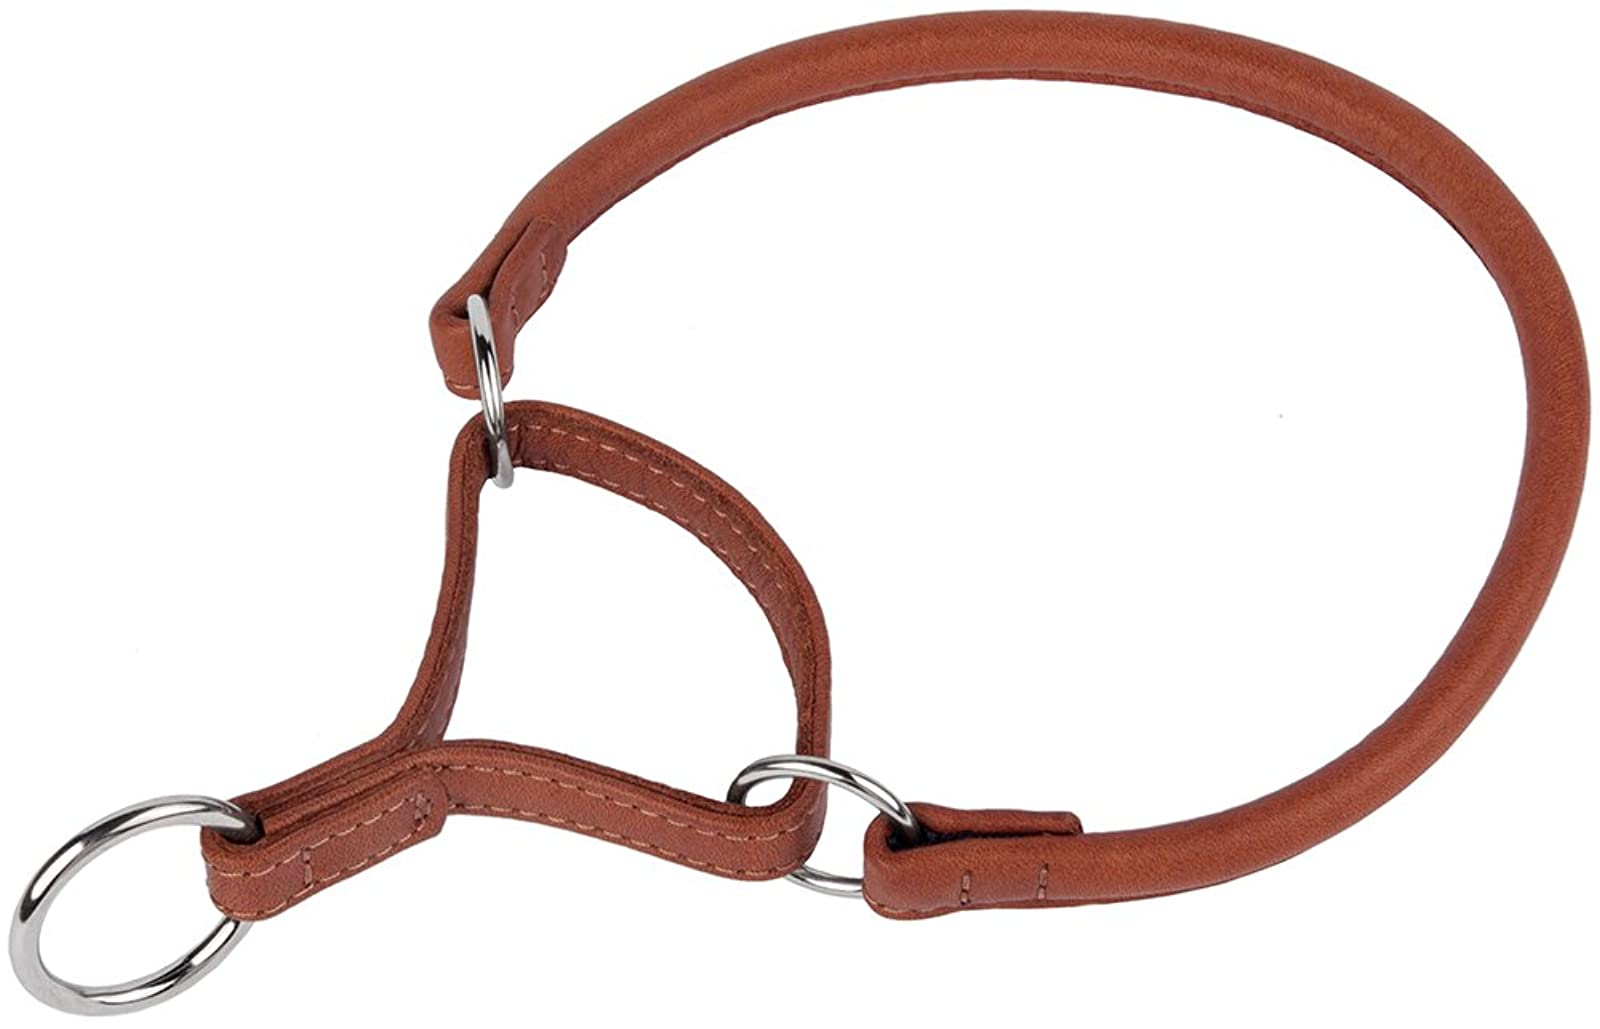 CollarDirect Rolled Martingale Dog Collar Training Genuine - 1